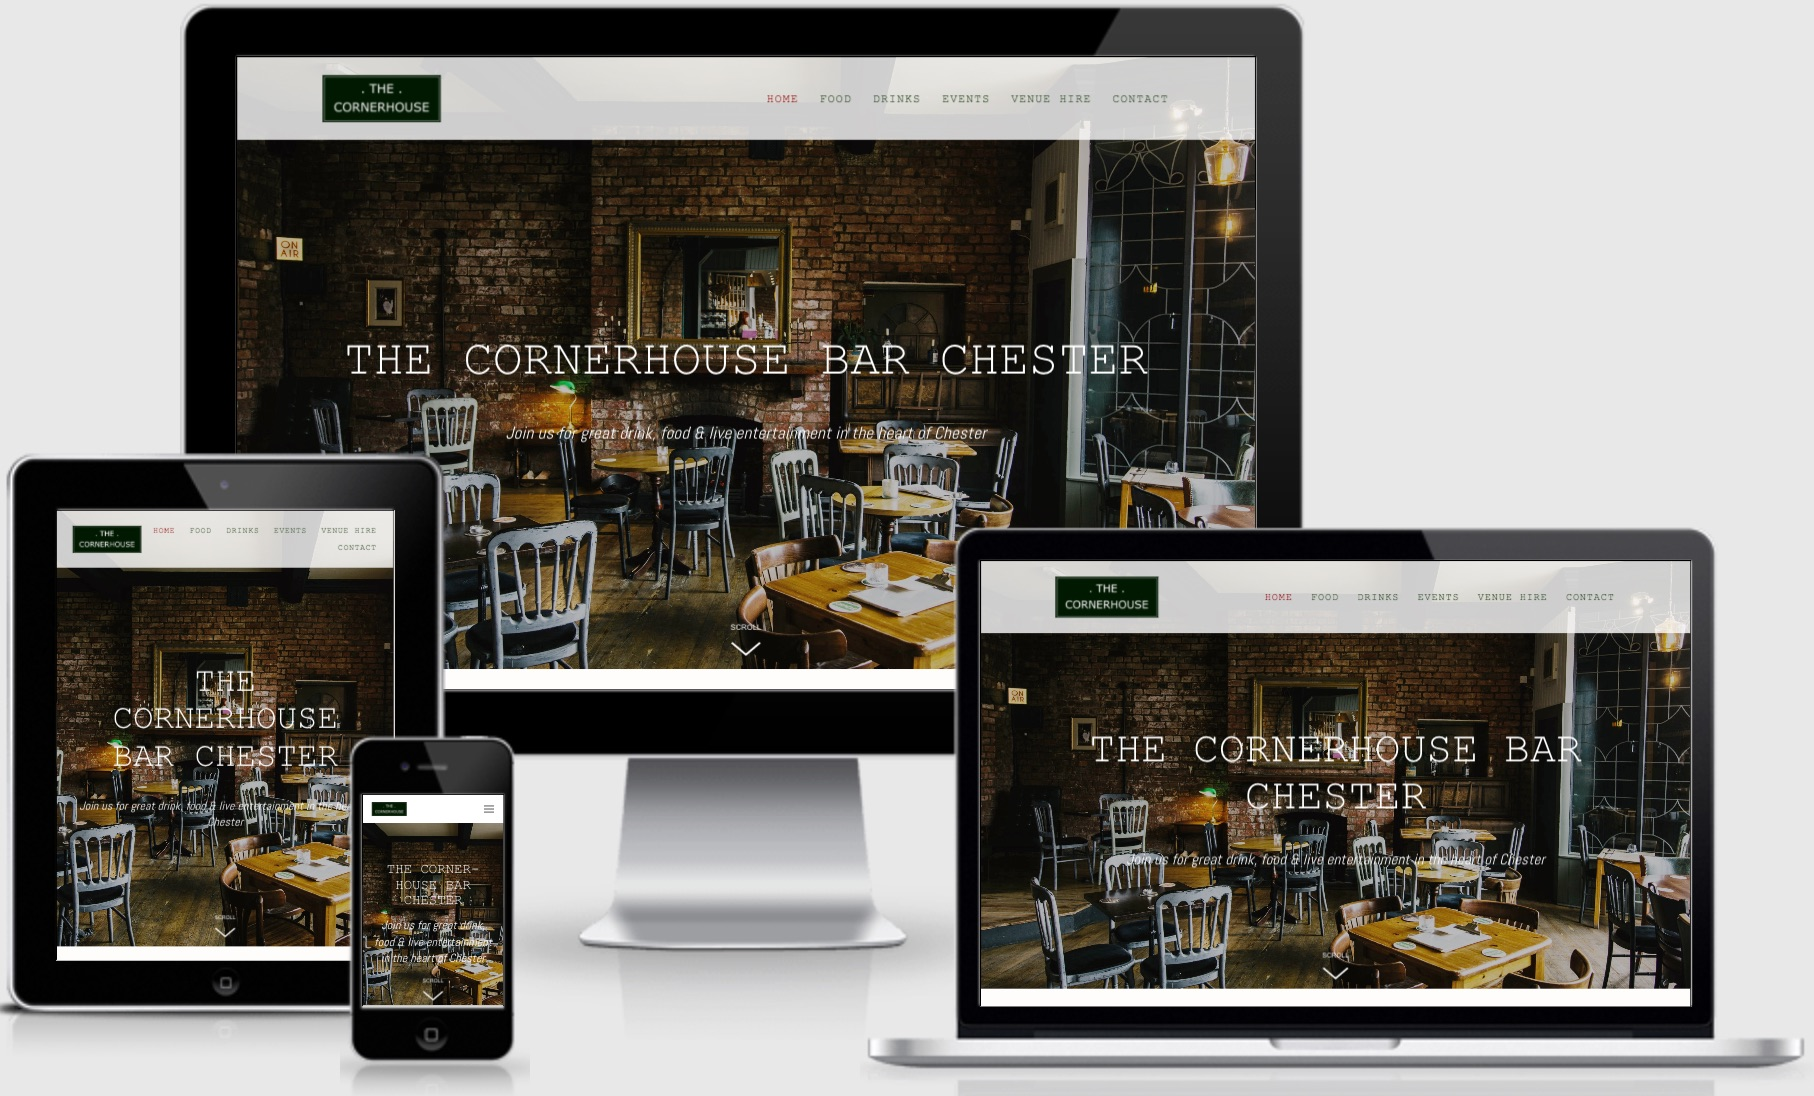 The Cornerhouse Bar